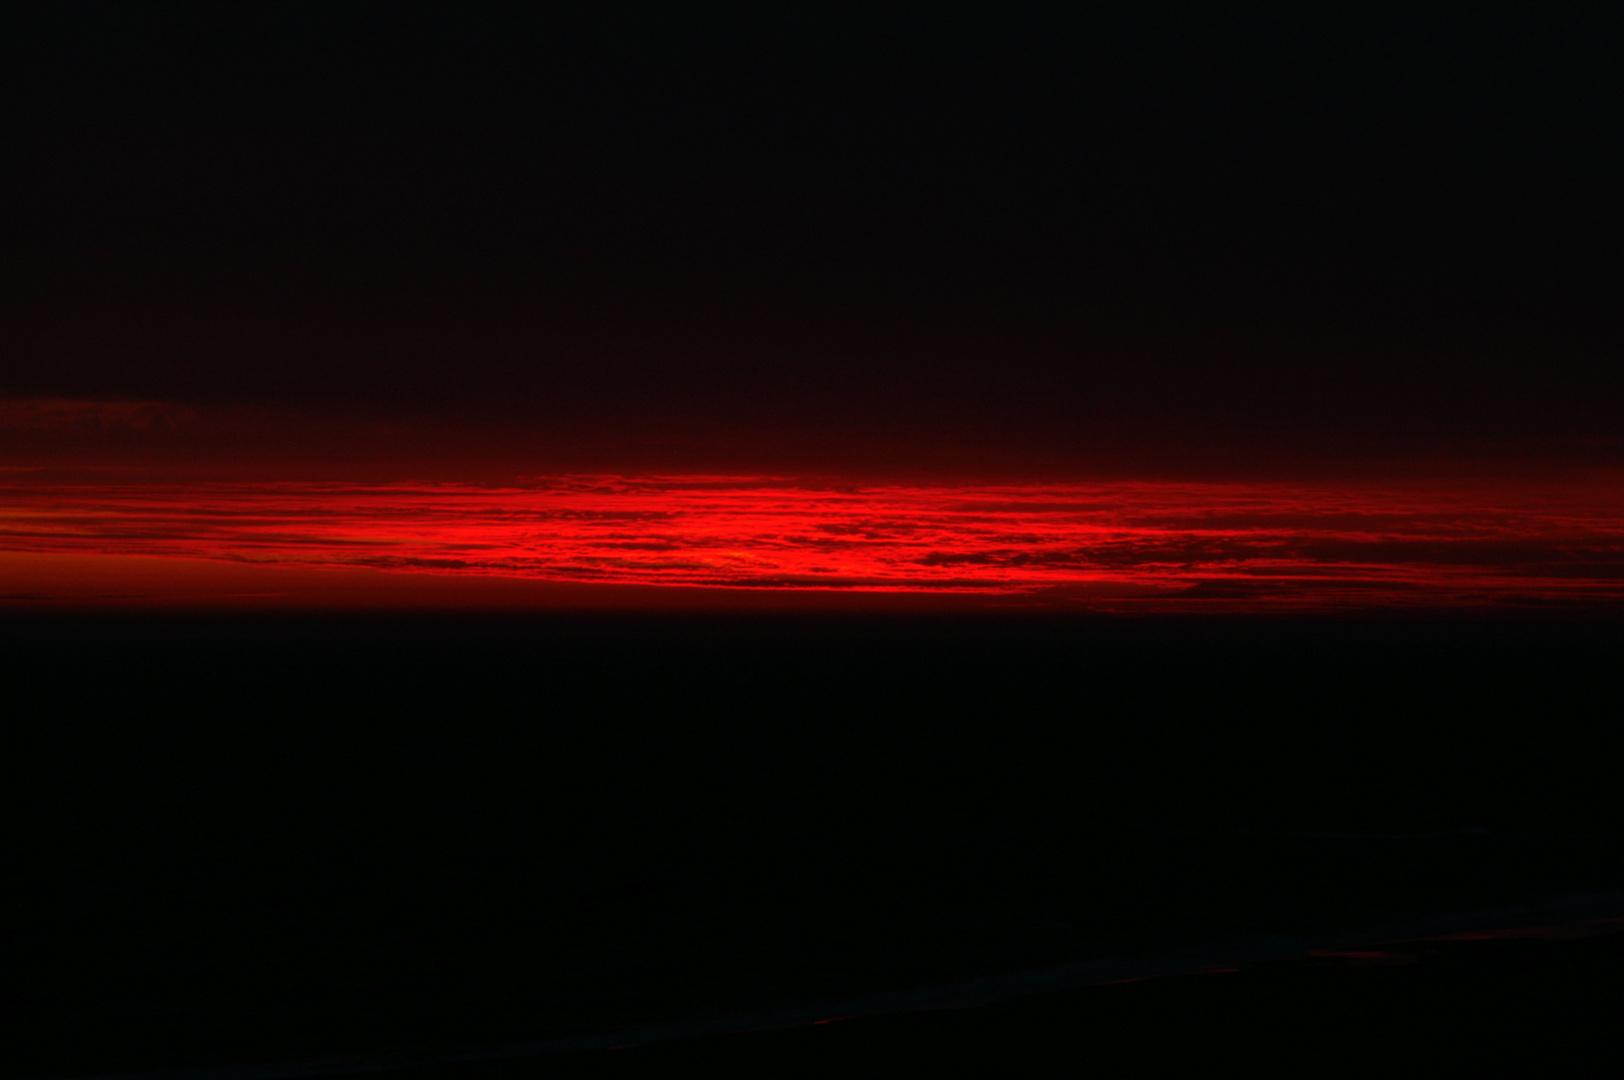 rot in schwarz